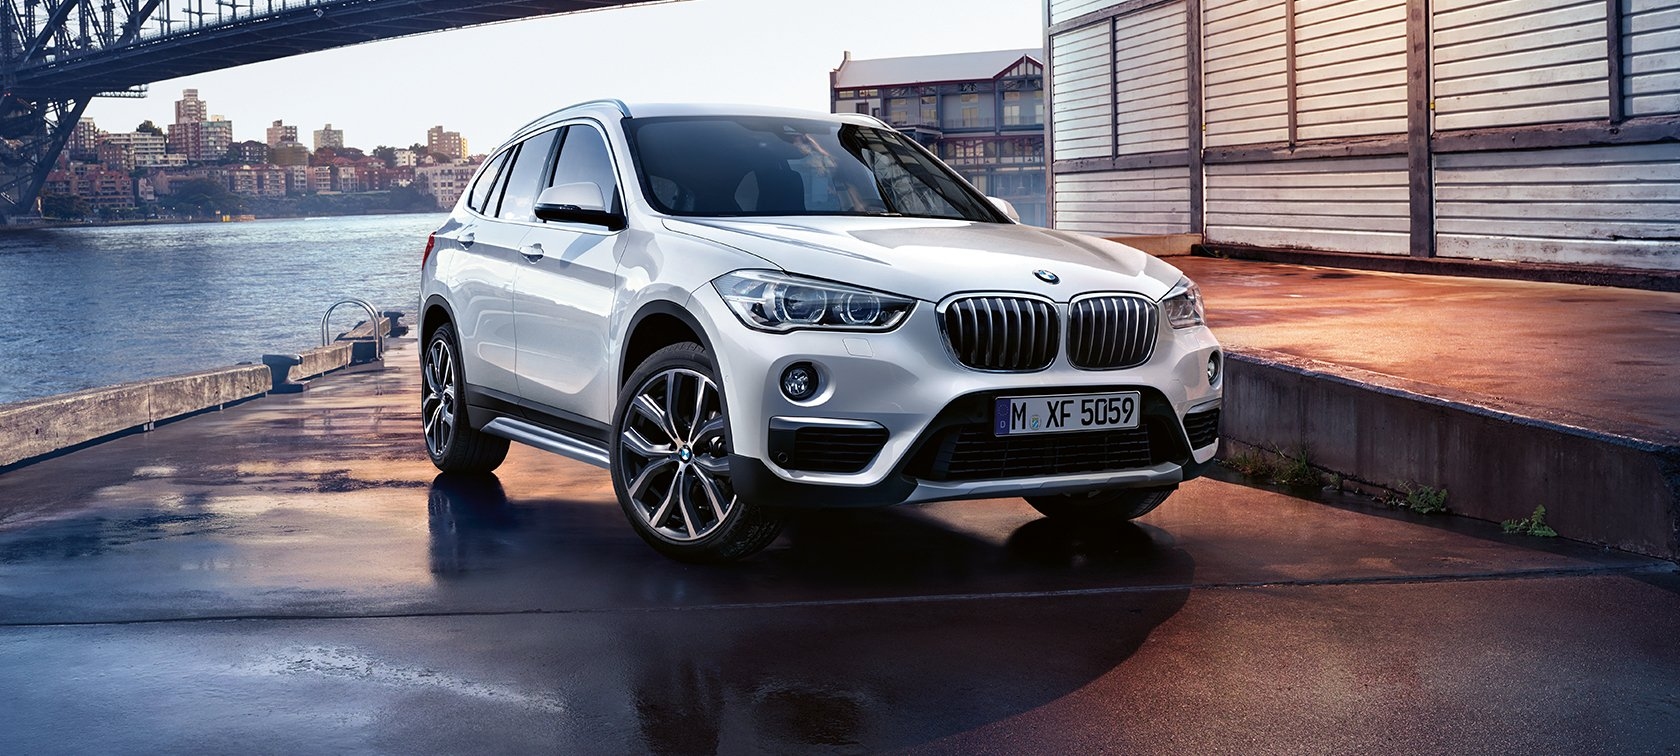 BMW แบบ SUV ค่าบำรุงรักษาแพงไหมคะ - Pantip